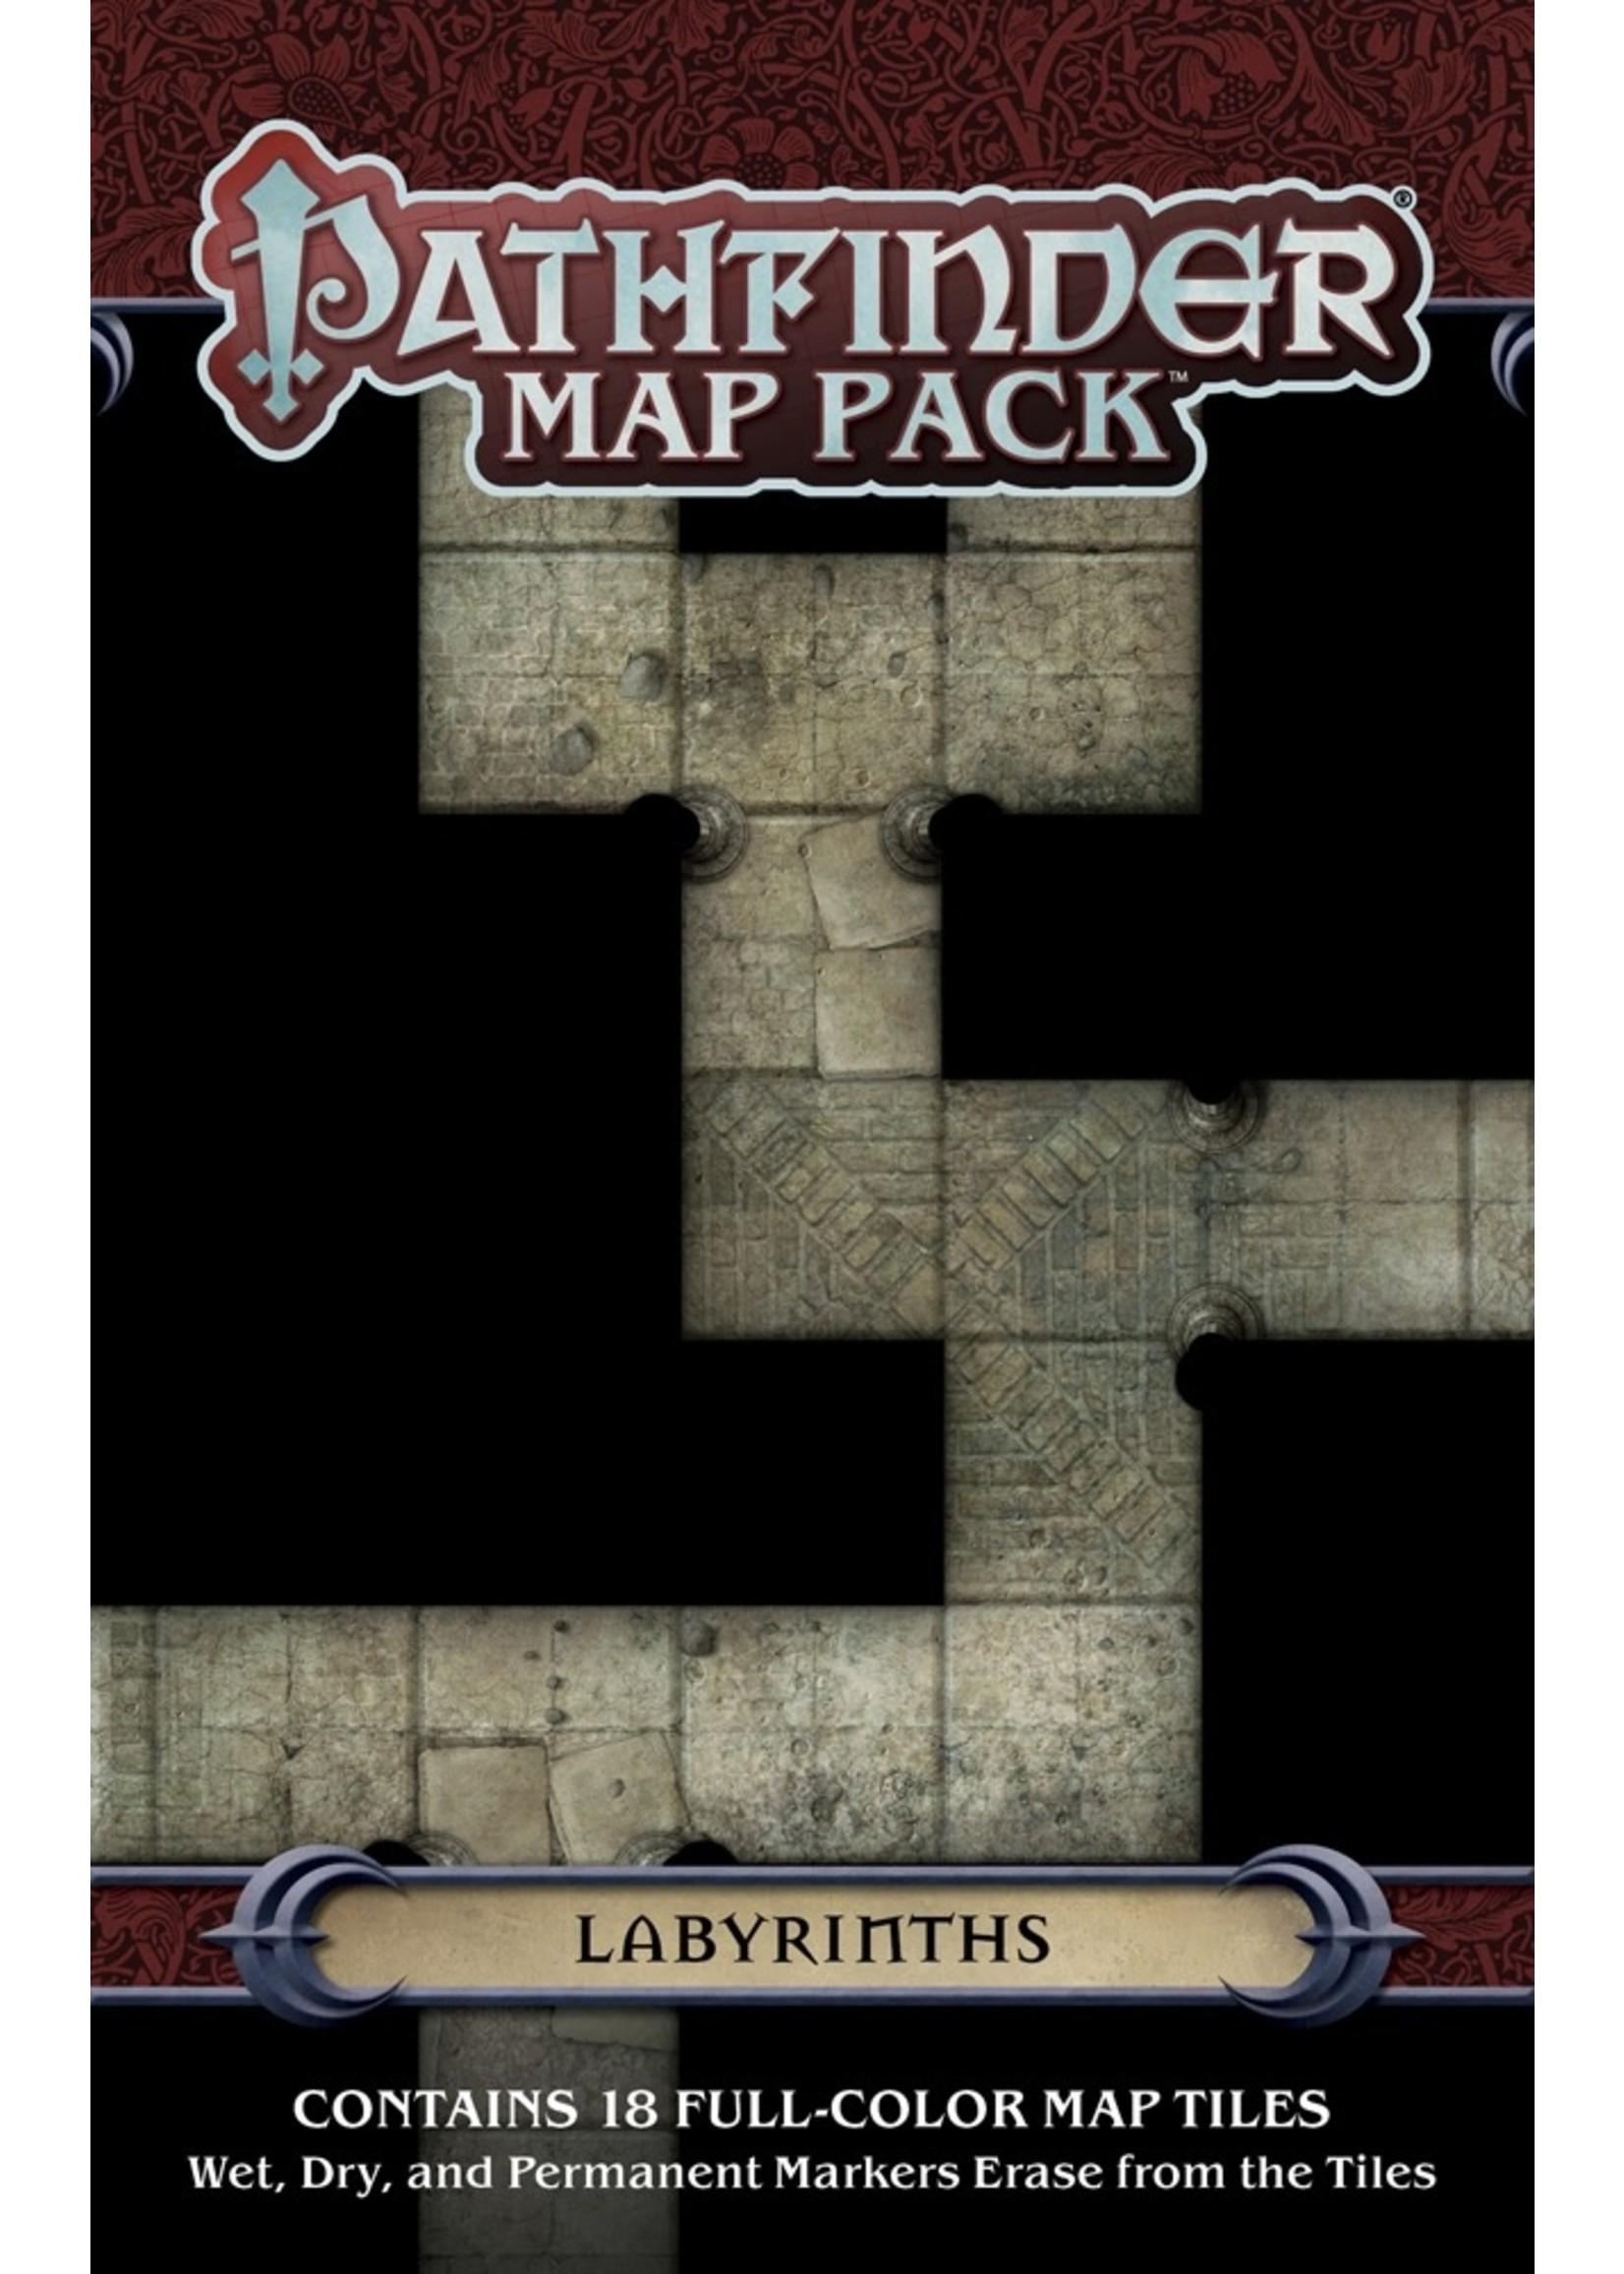 Pathfinder RPG: Map Pack - Labyrinths